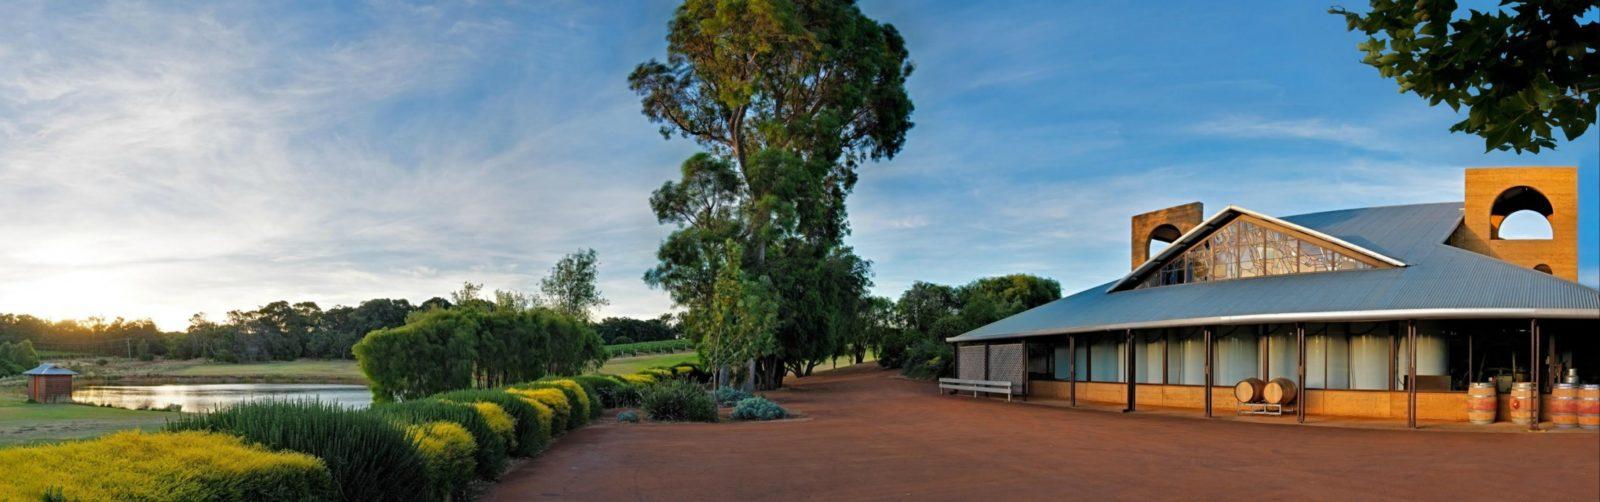 Lenton Brae, Wilyabrup, Western Australia